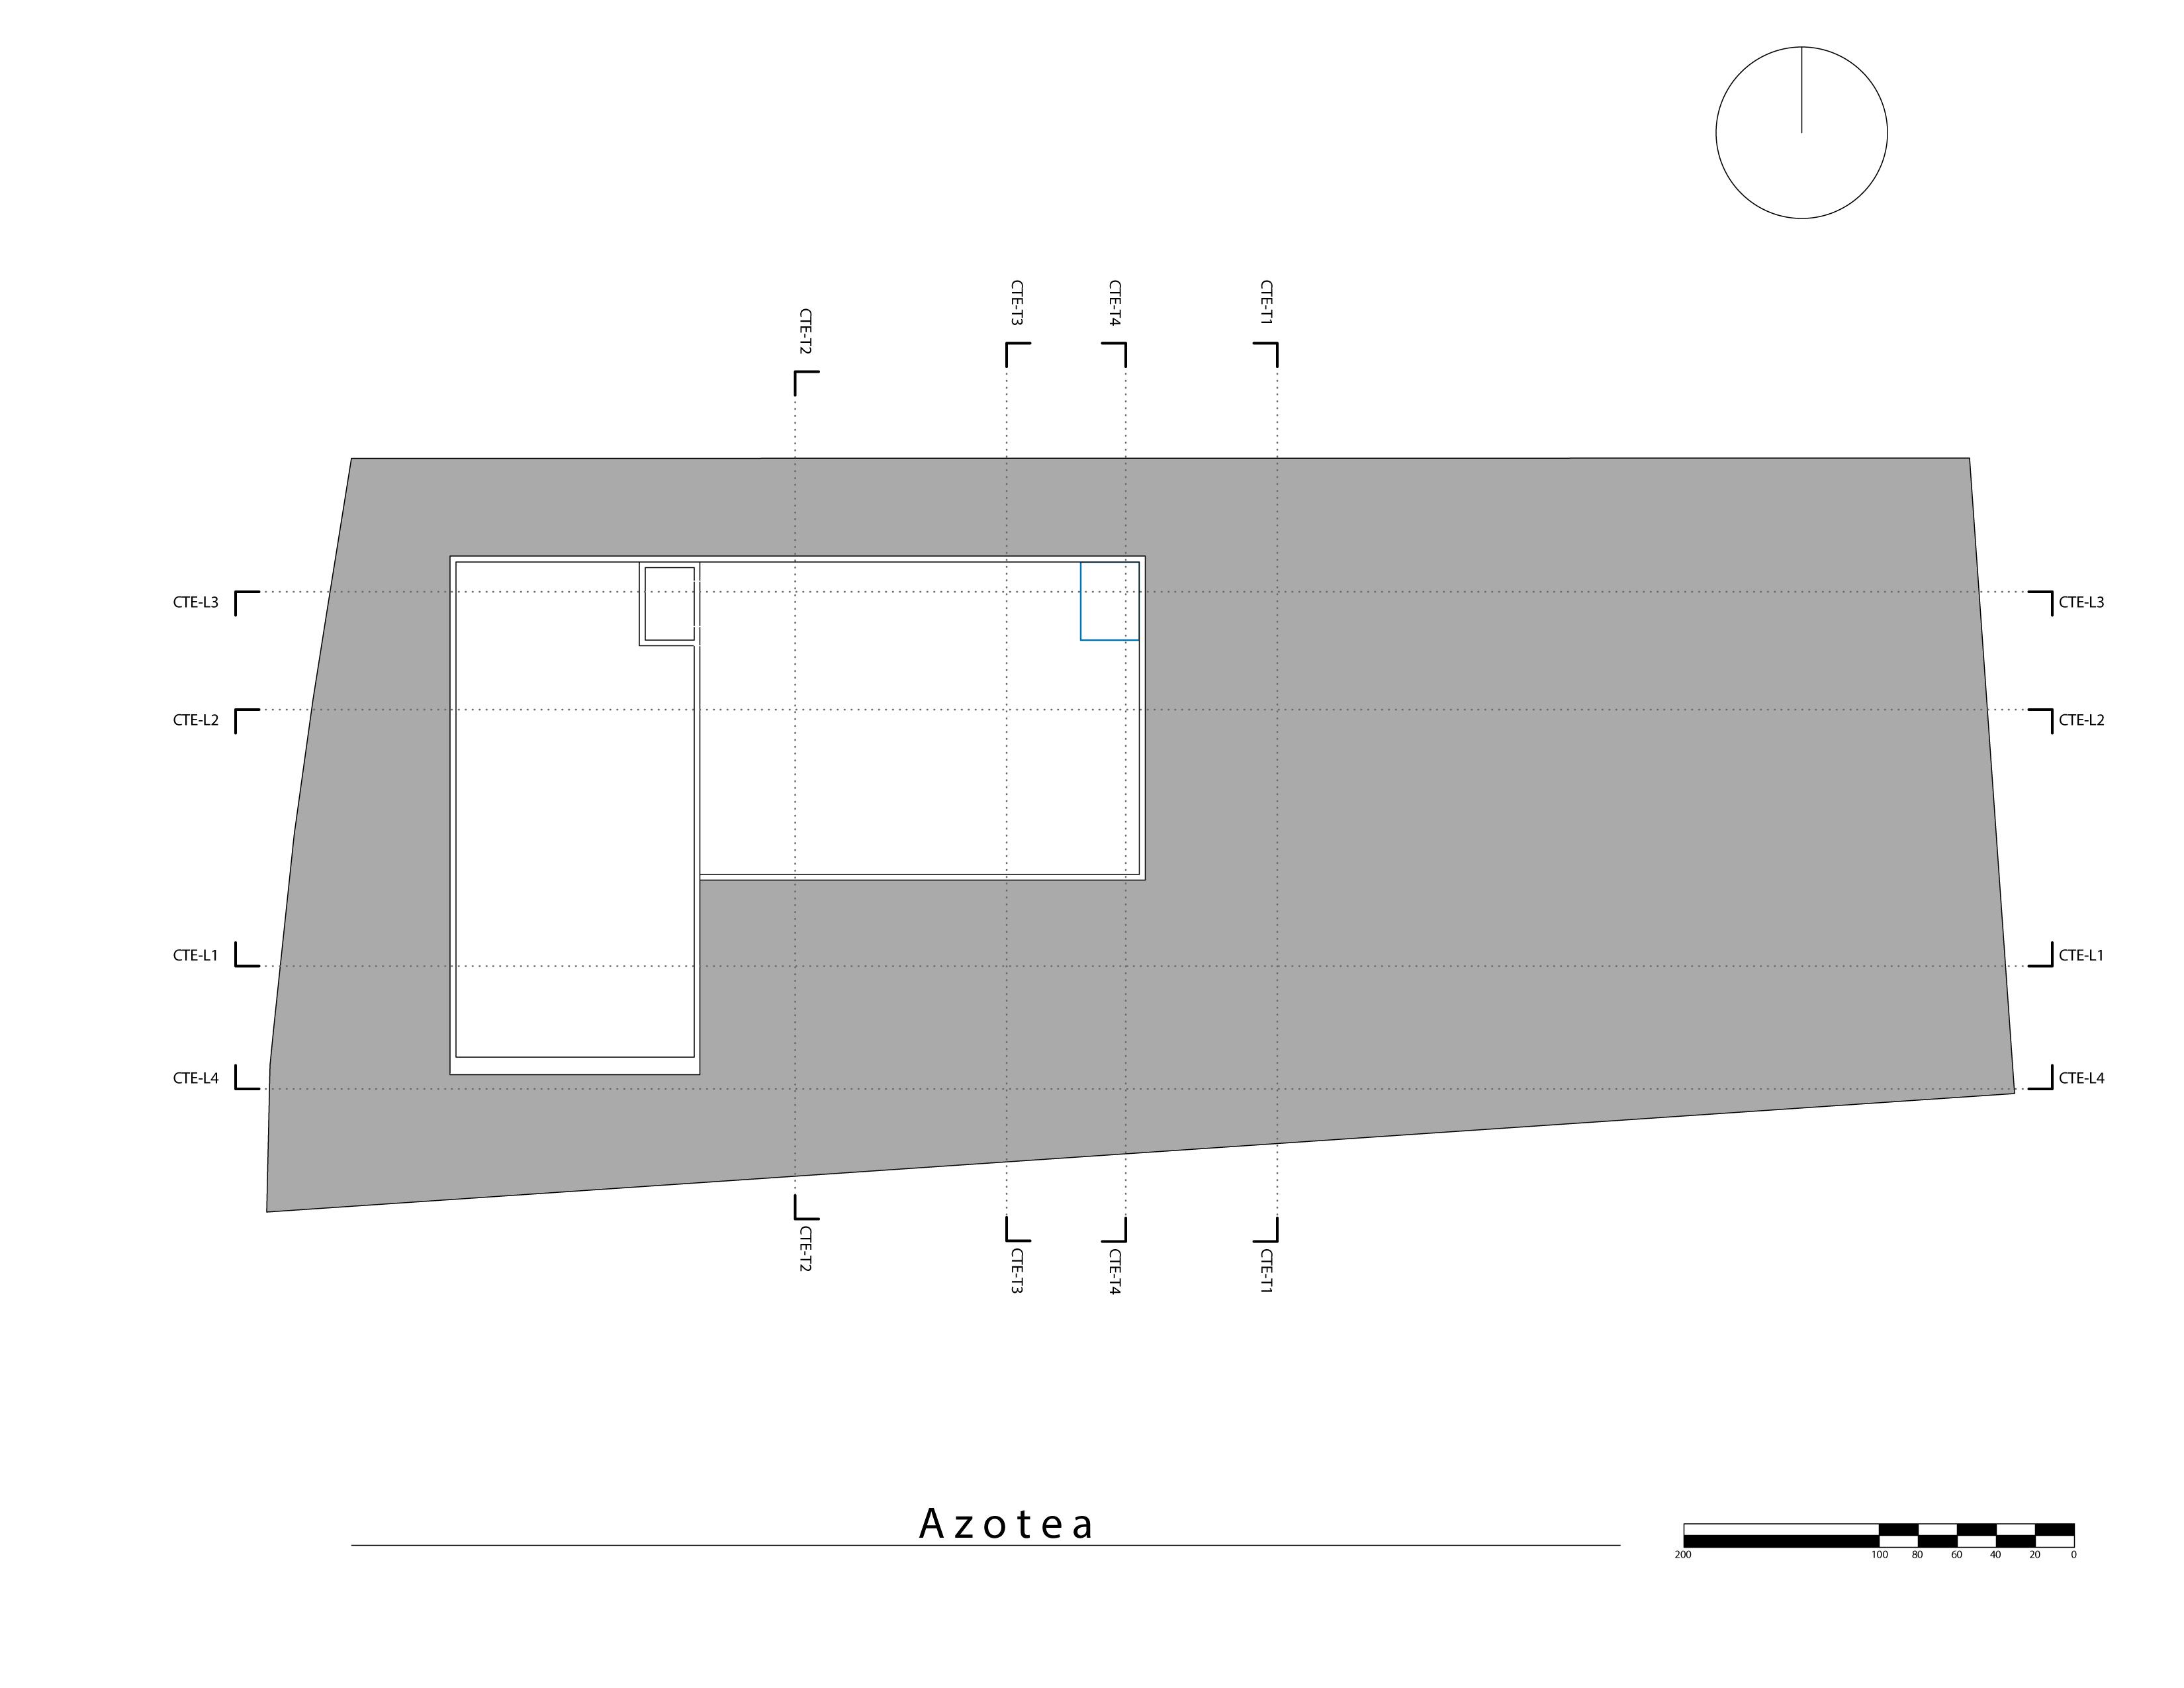 azotea-01